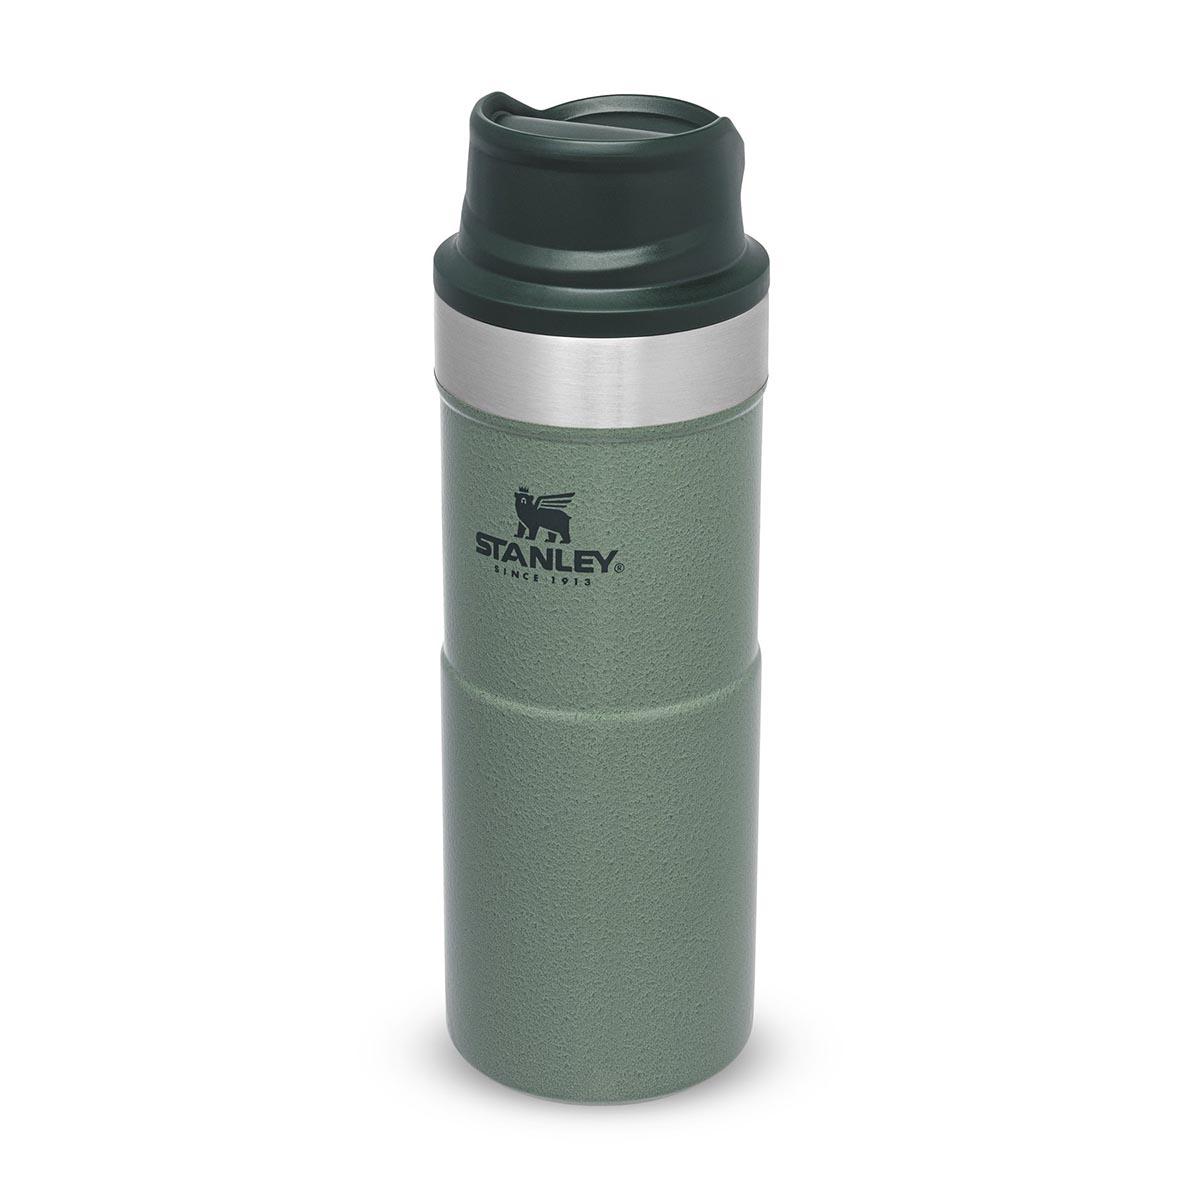 Stanley The Trigger-Action Travel Mug .35L / 12OZ AS1009848006